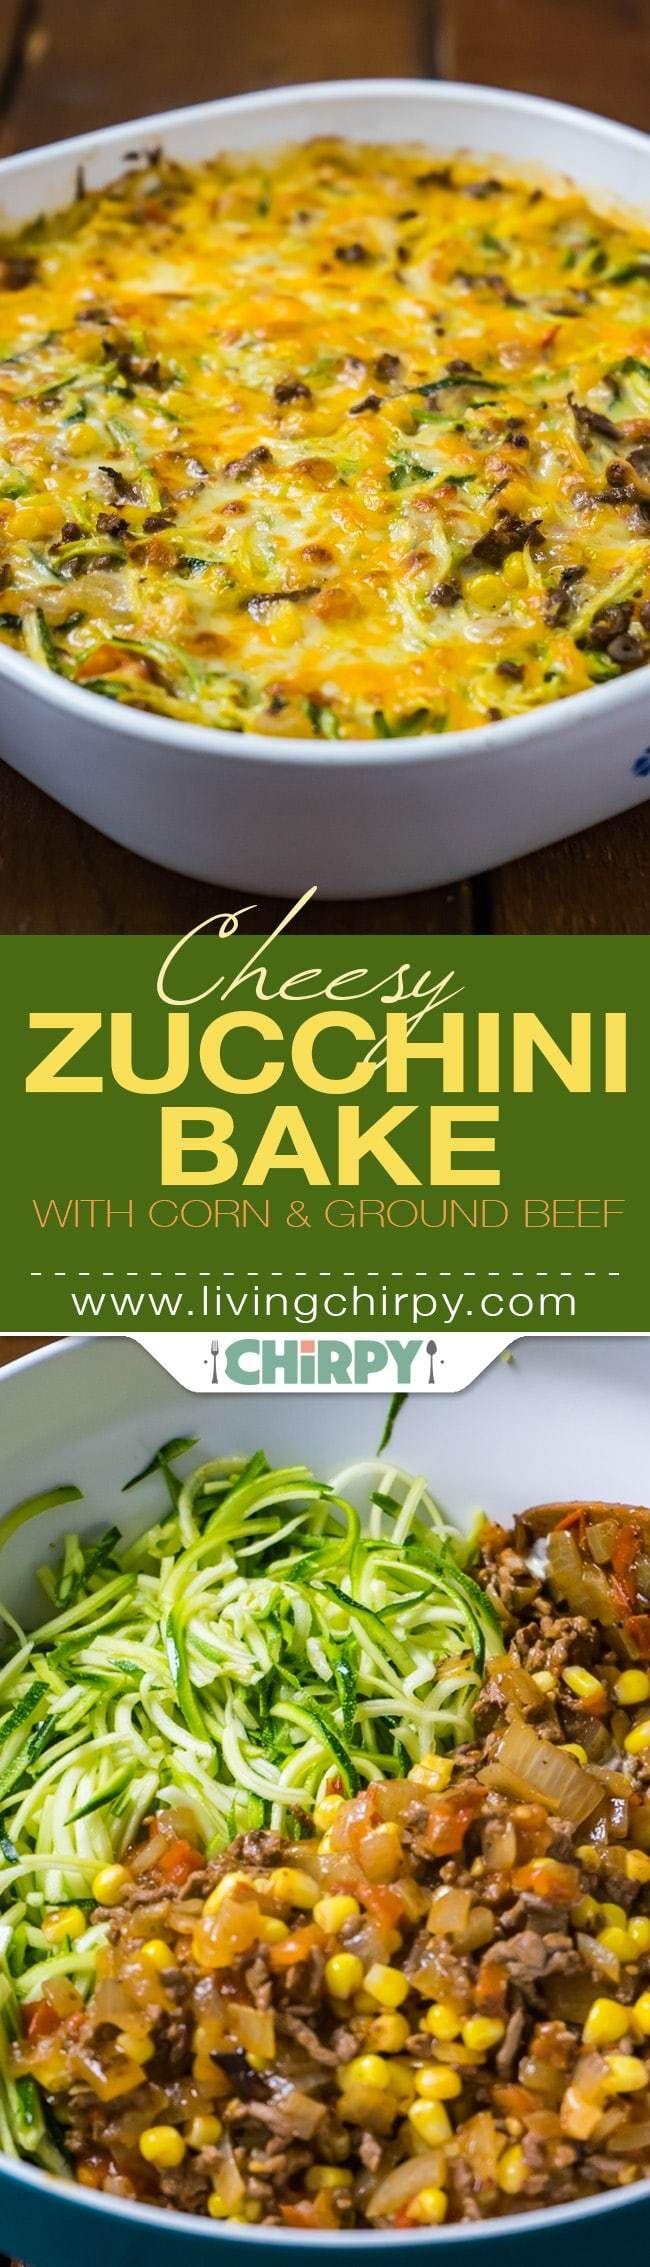 Cheesy Zucchini Bake With Corn And Ground Beef Recipe Cheesy Zucchini Bake Zoodle Recipes Beef Recipes